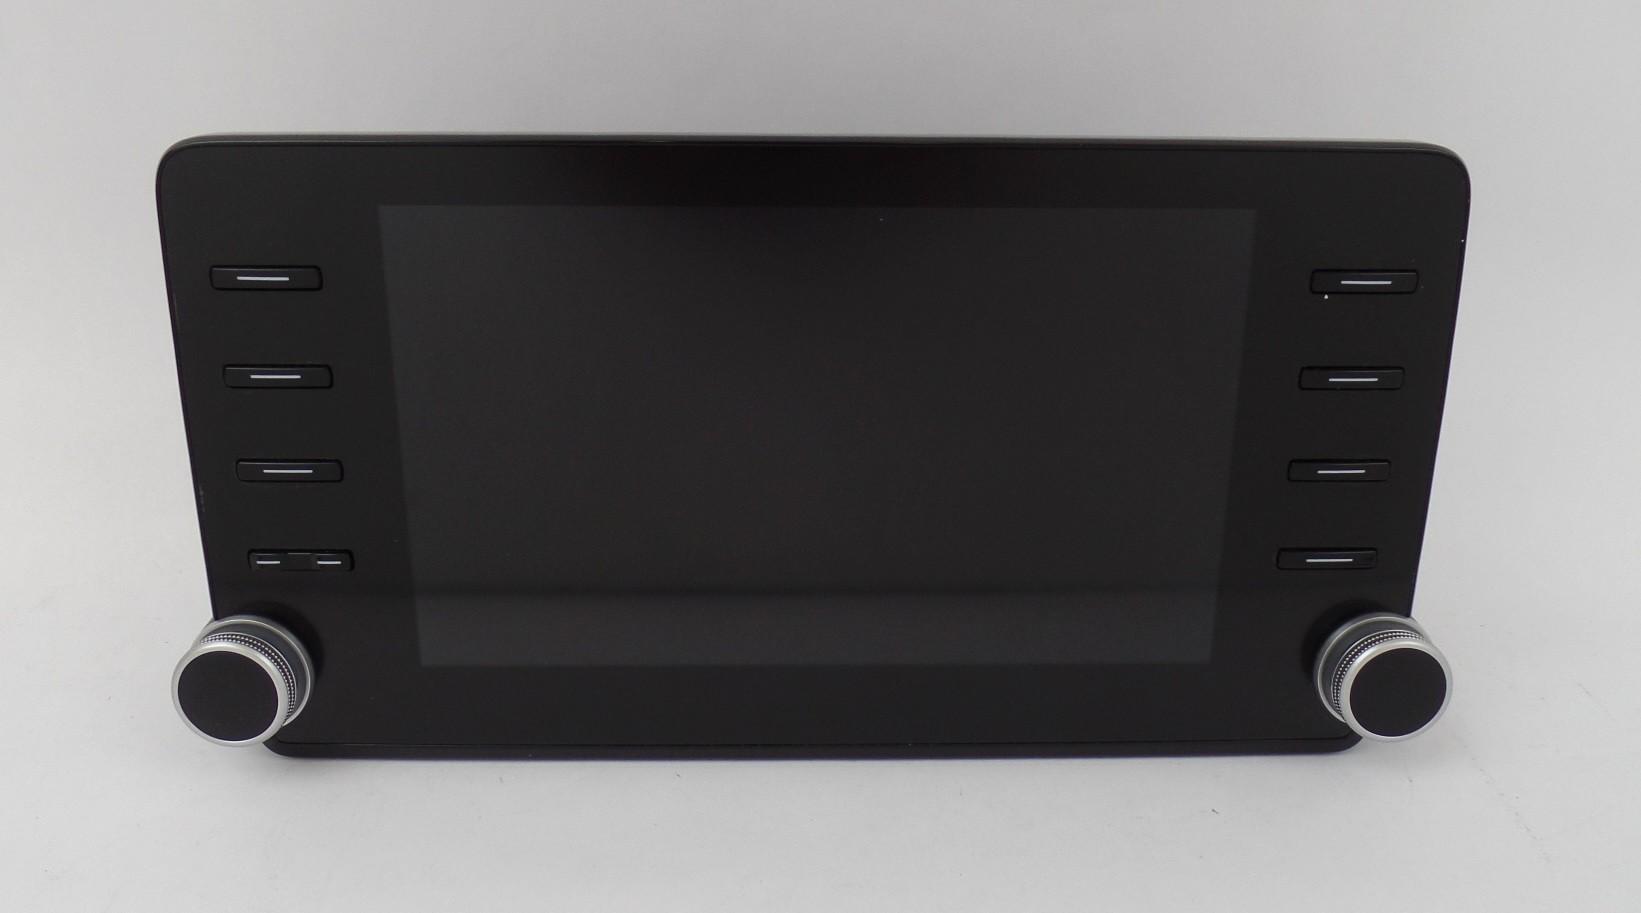 18-19 Honda Accord 39710-TVA-A110-M1 Display Screen